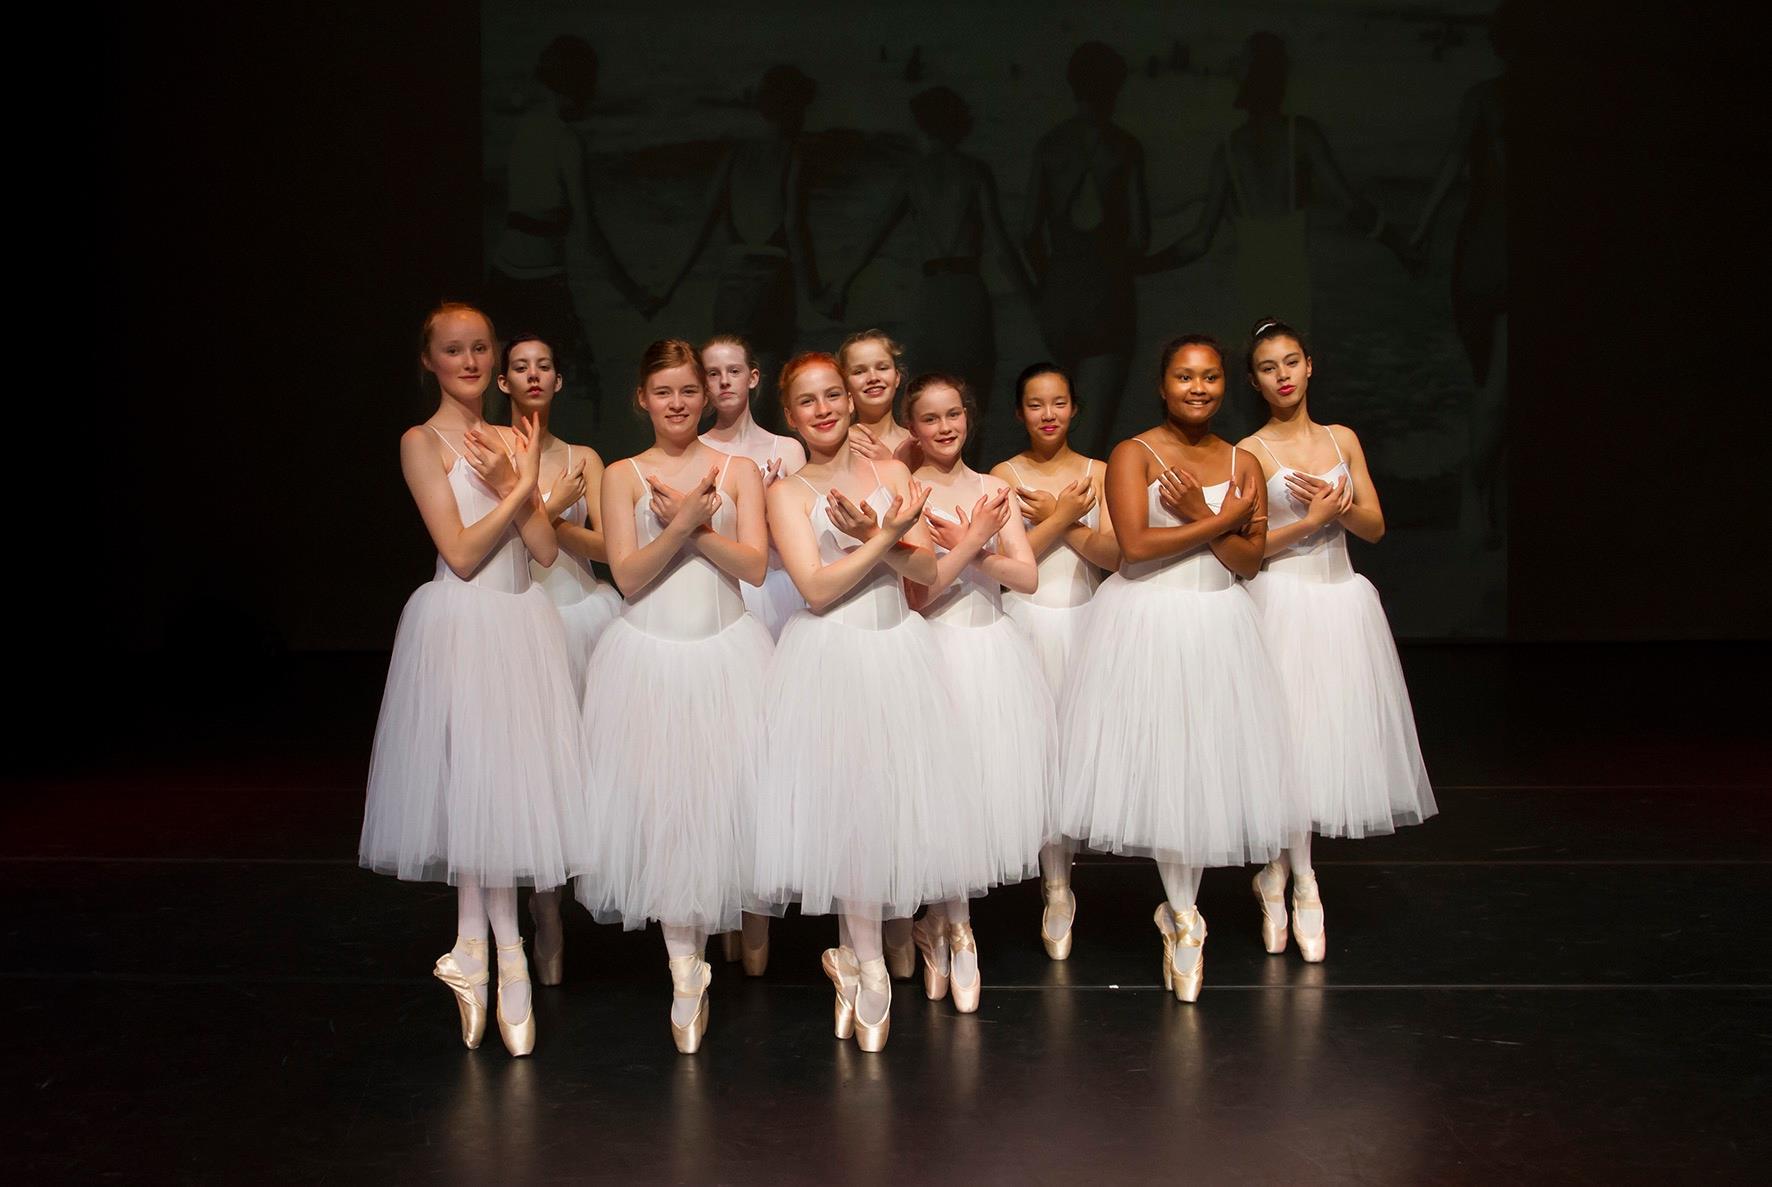 Balletschool Marcella